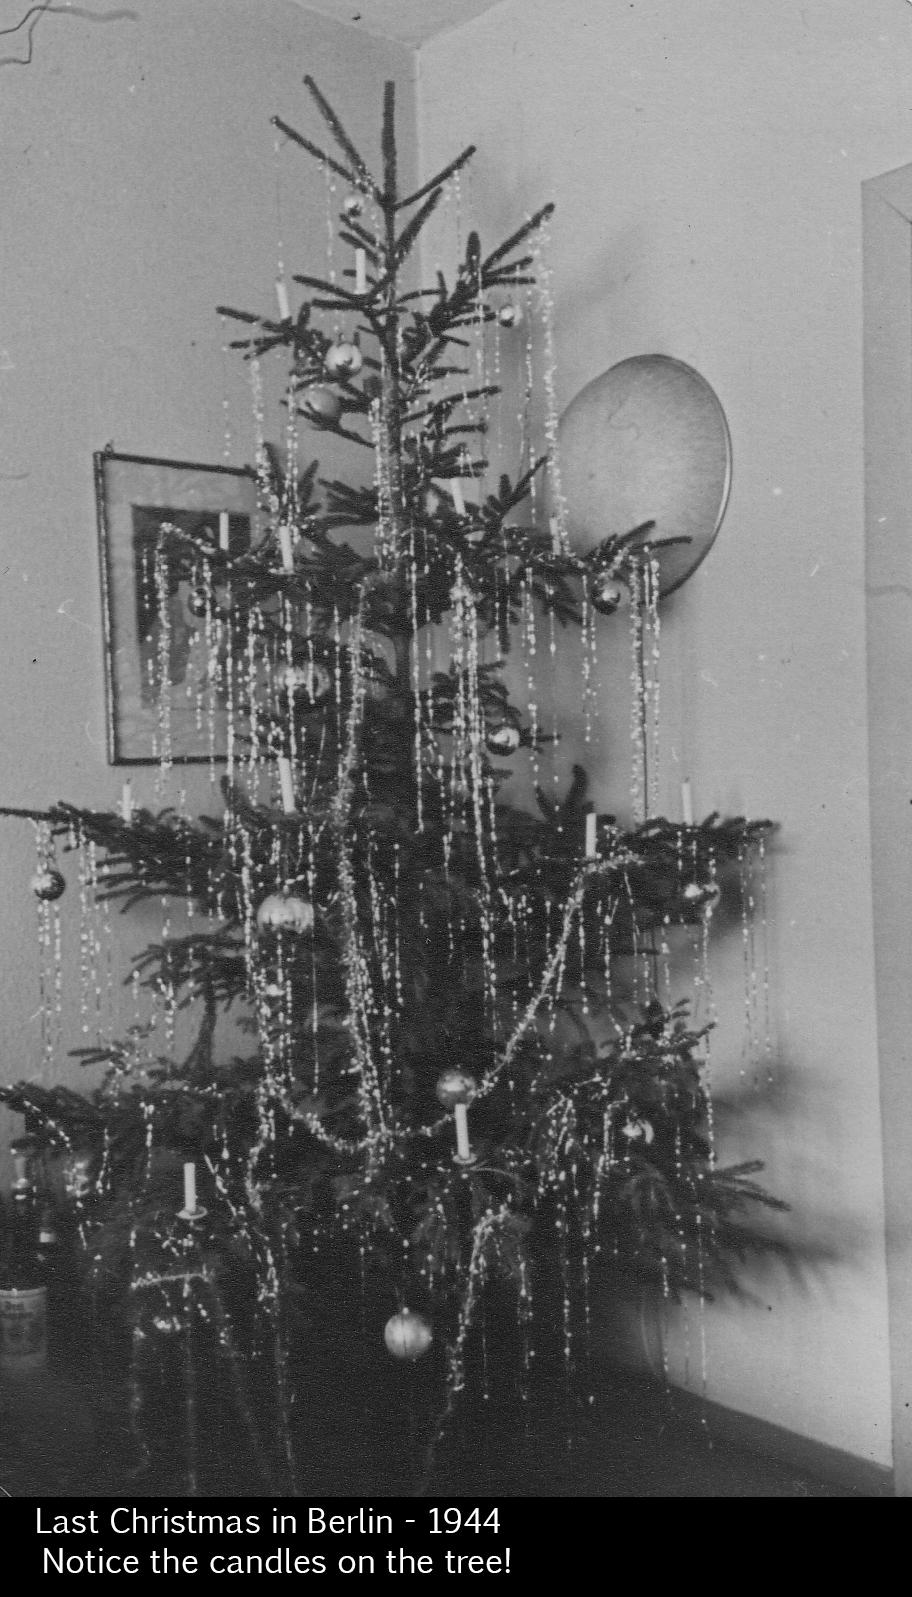 128_Scotts_1935-1942.jpg